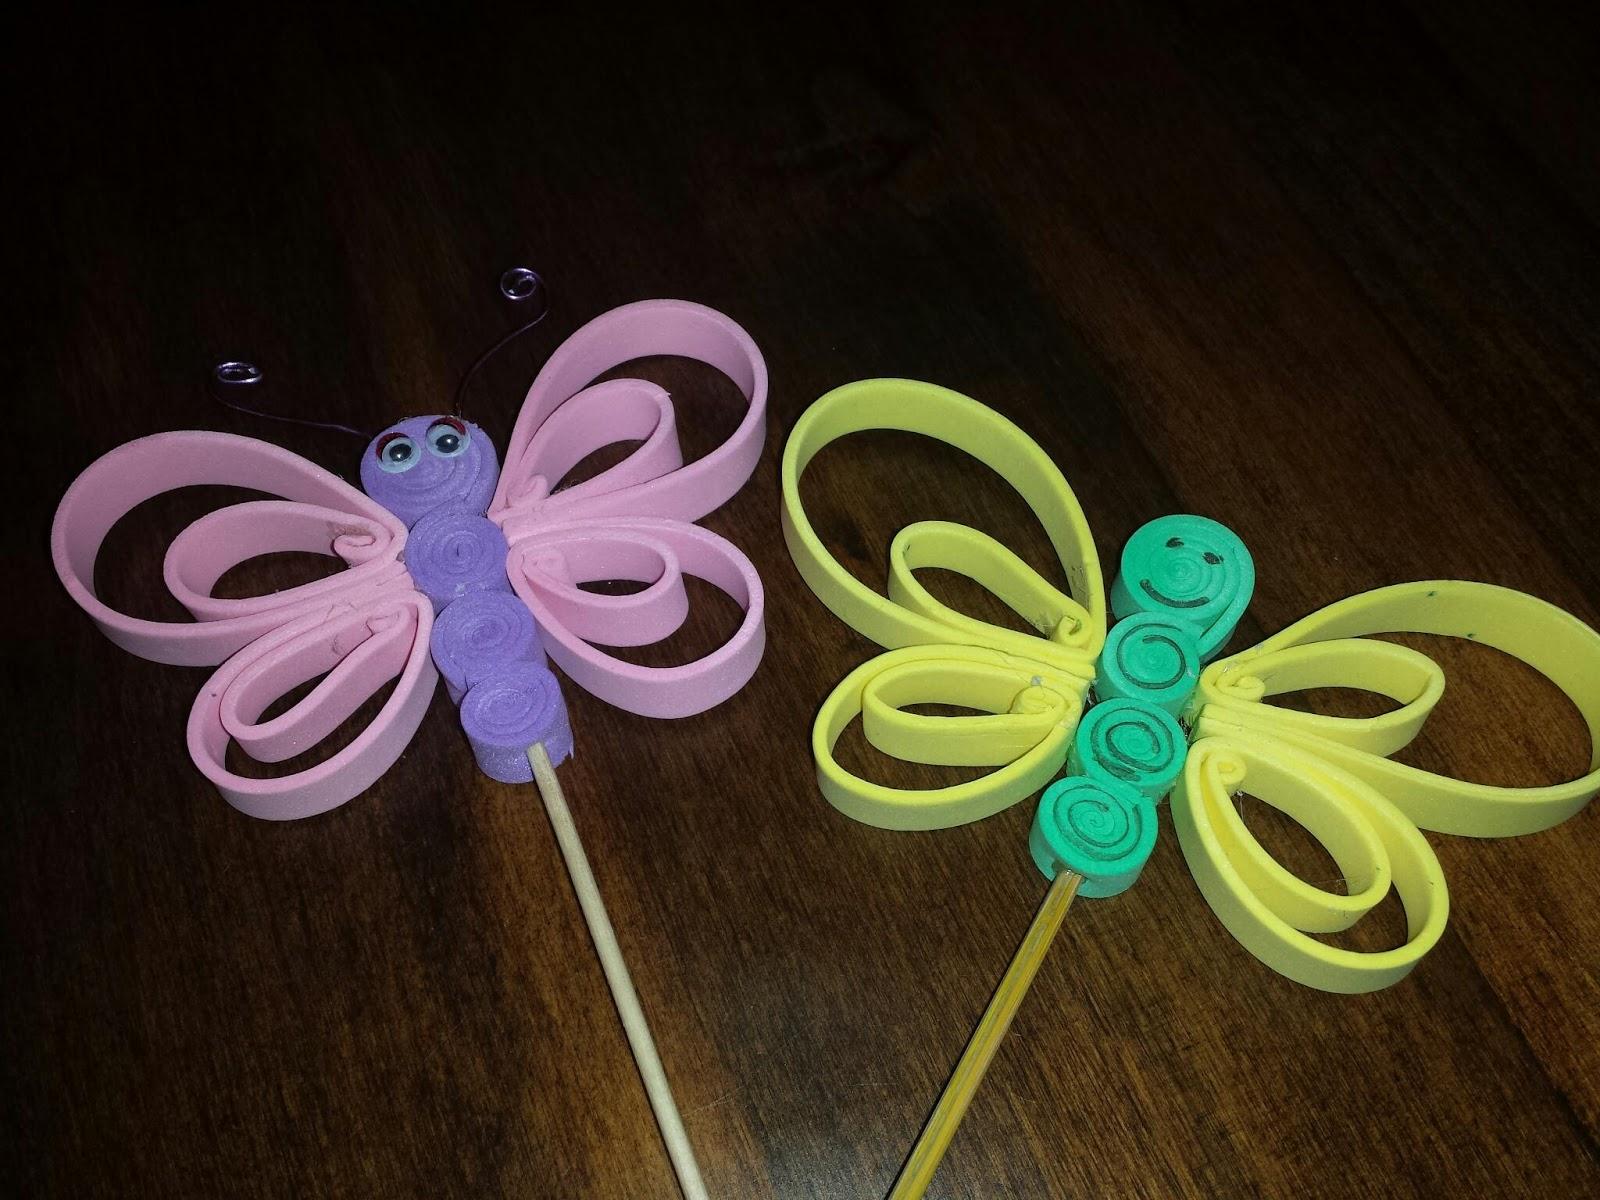 Mis originales jaboncitos mariposas de goma eva - Mariposas goma eva ...